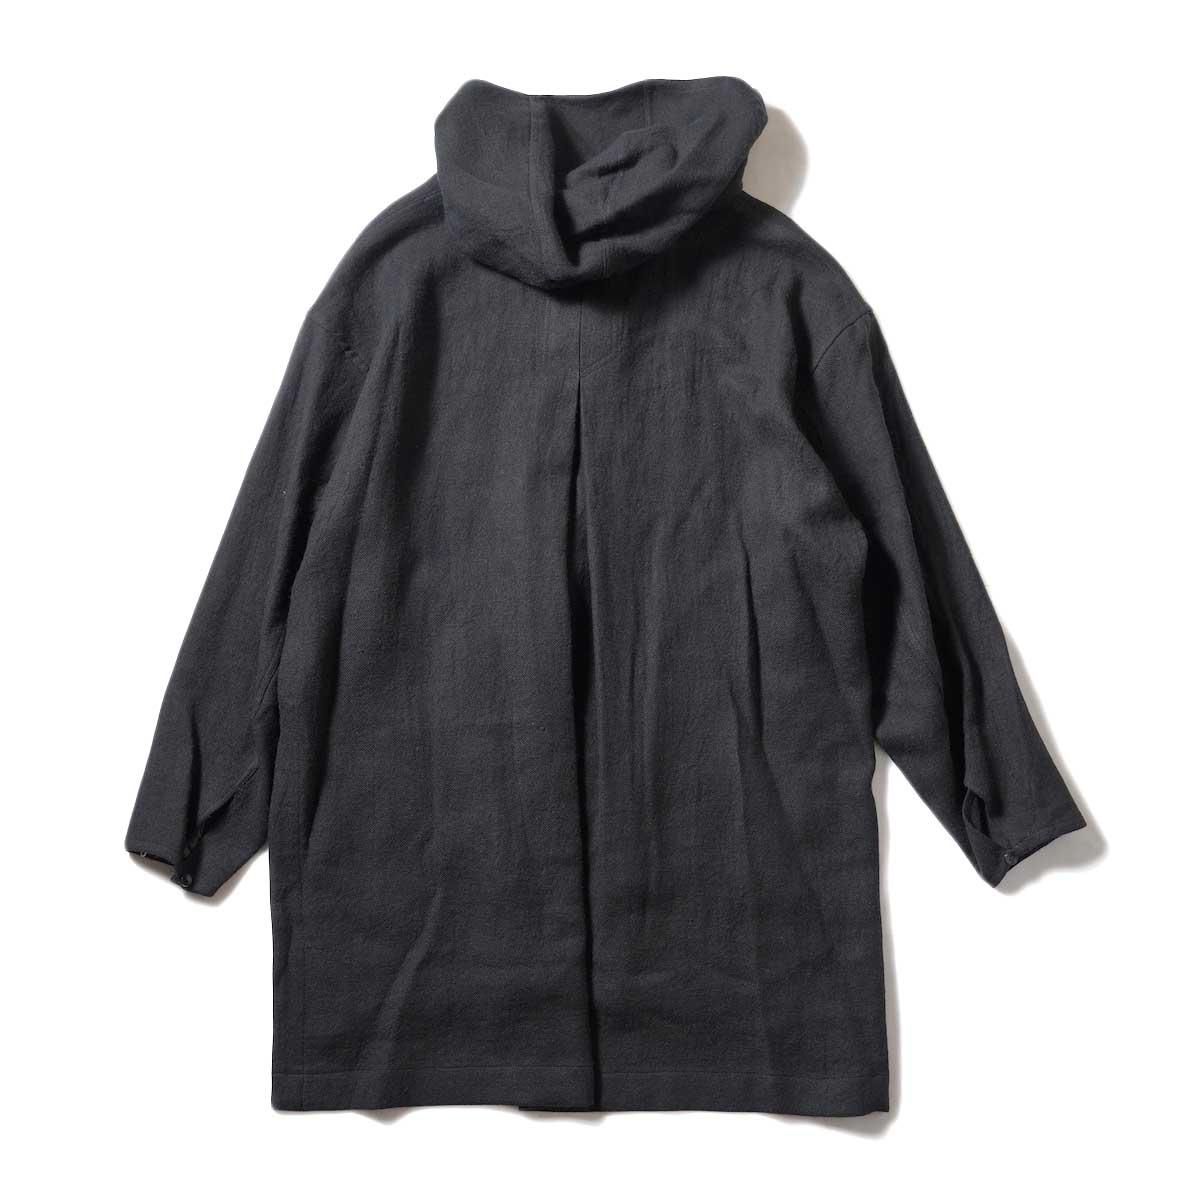 ARCHI / SOFT TWIST TWILL HOODIE OVER SHIRTS (Black) 背面